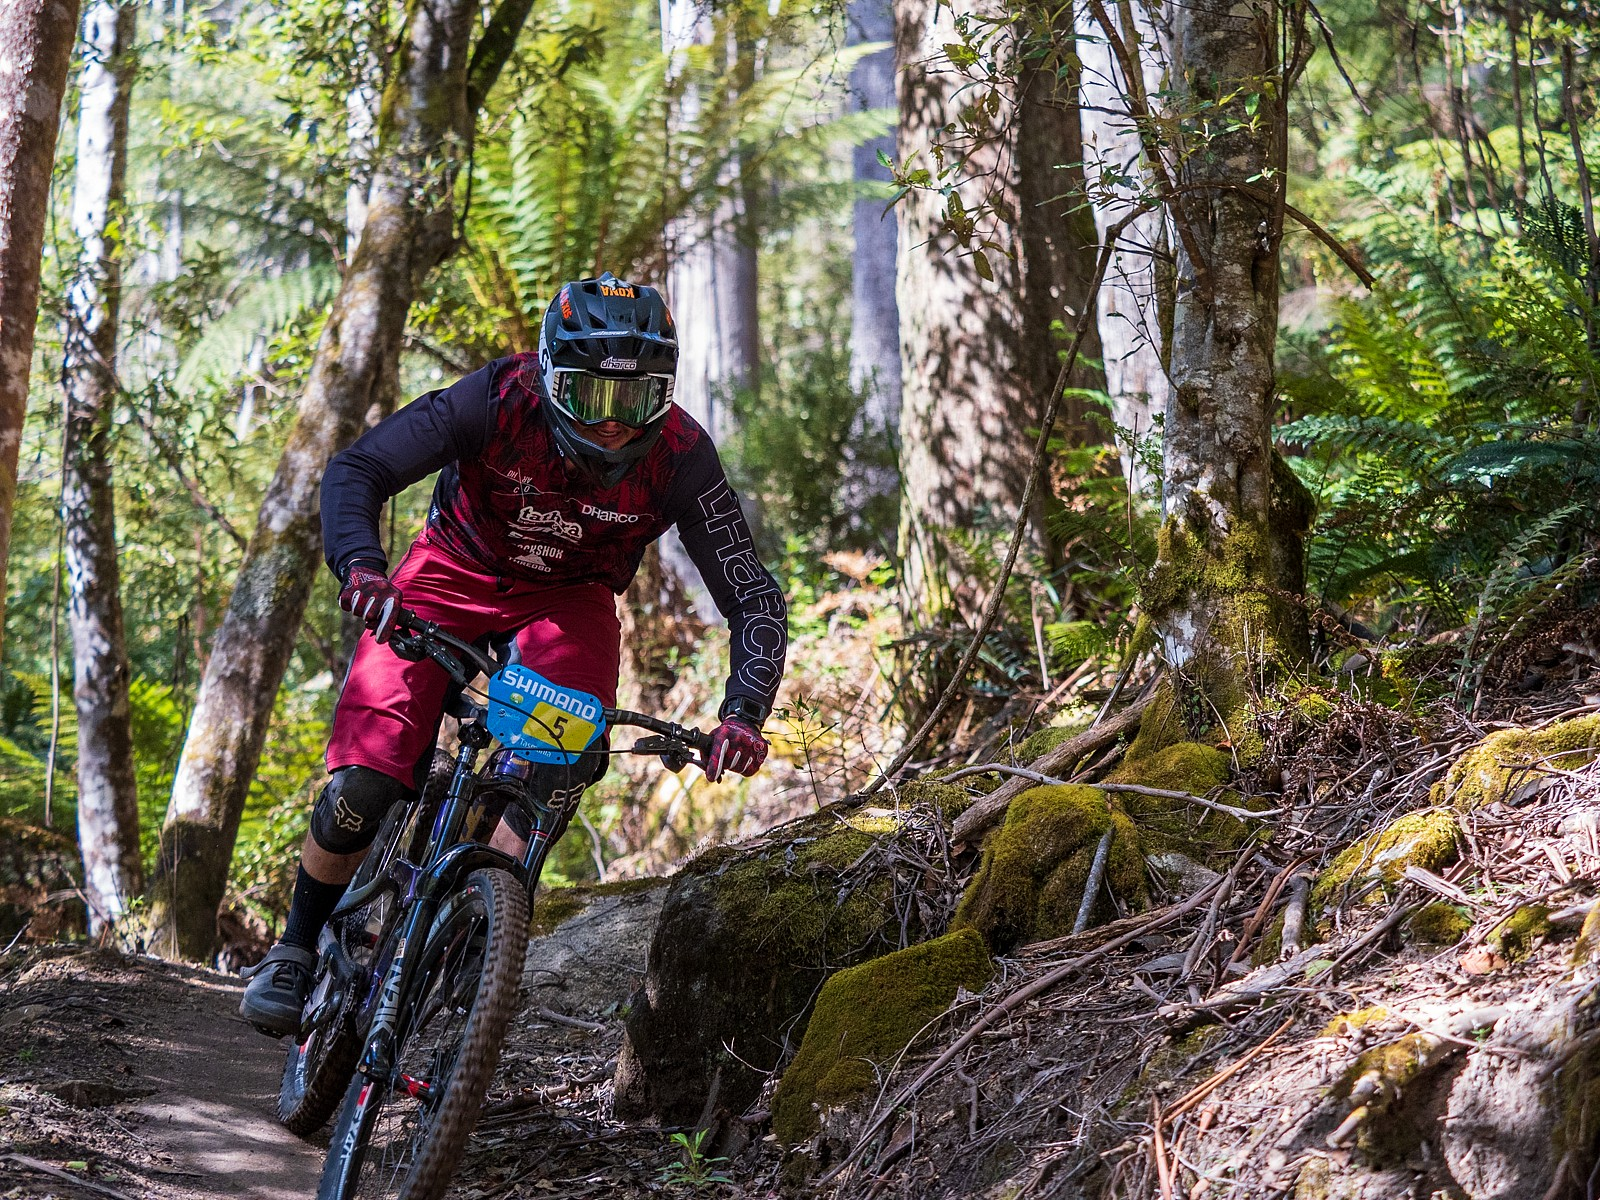 171119-Tassie-0458 - jack.fletcher86 - Mountain Biking Pictures - Vital MTB